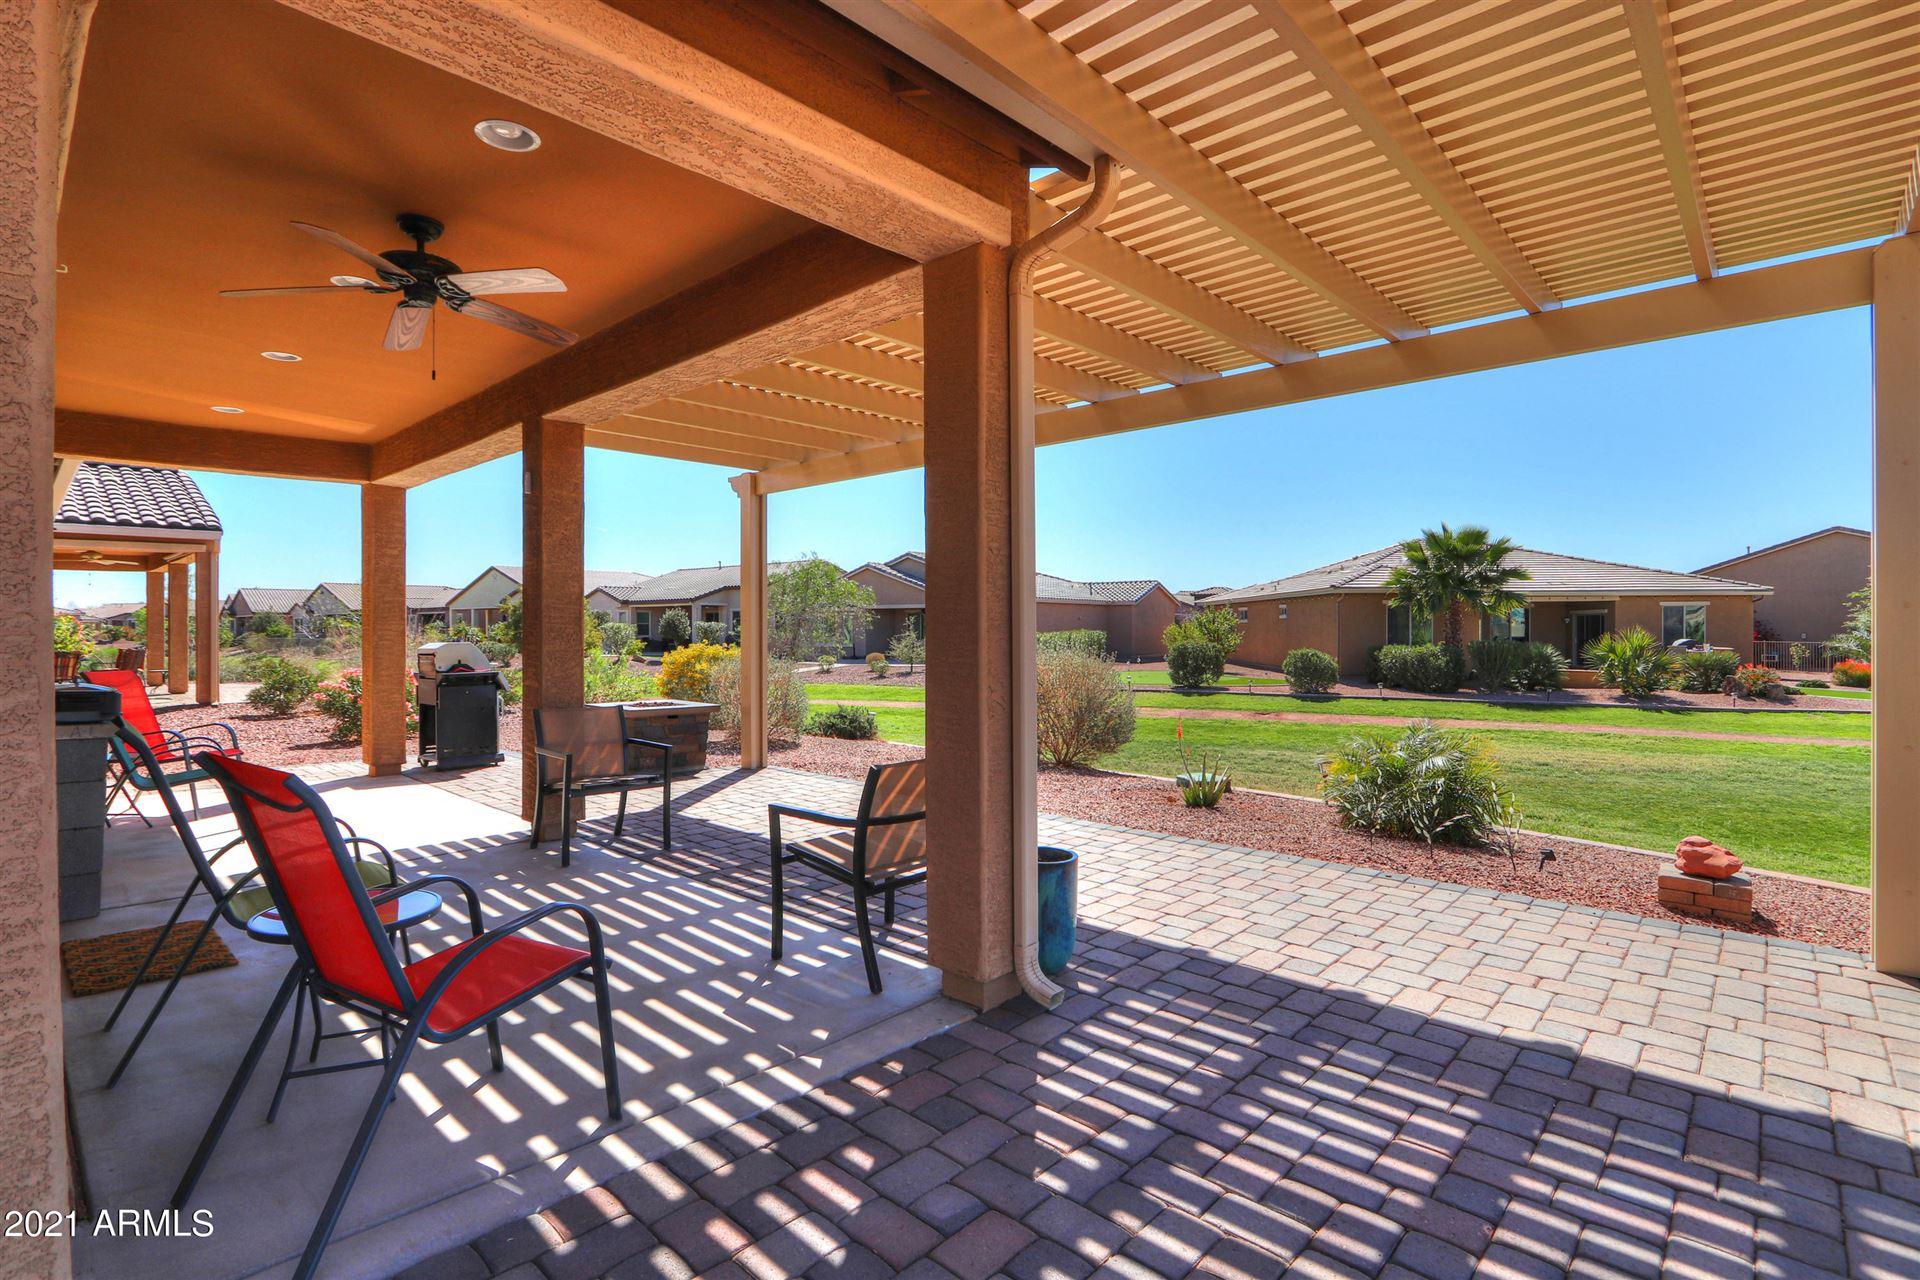 Photo of 41735 W SUMMER WIND Way, Maricopa, AZ 85138 (MLS # 6200448)